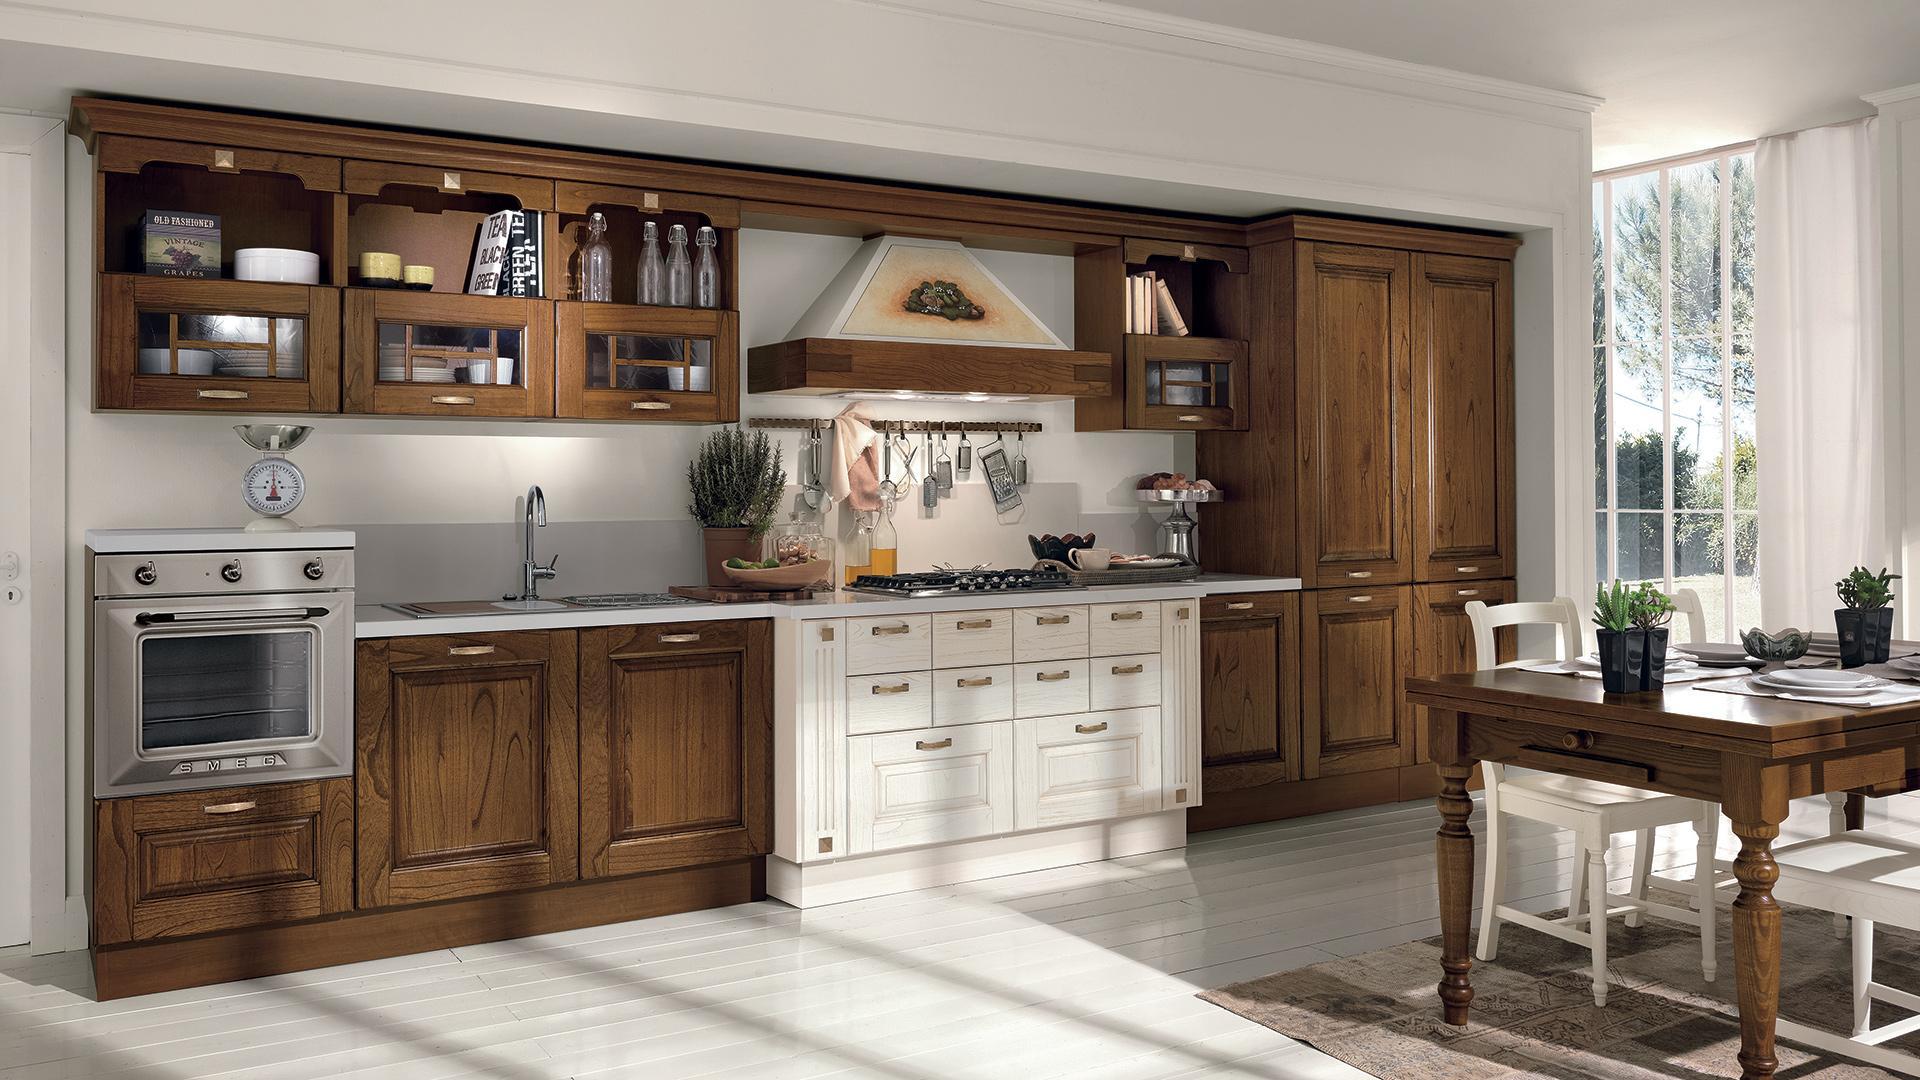 Cucine Lube Laura - Arredalcasa